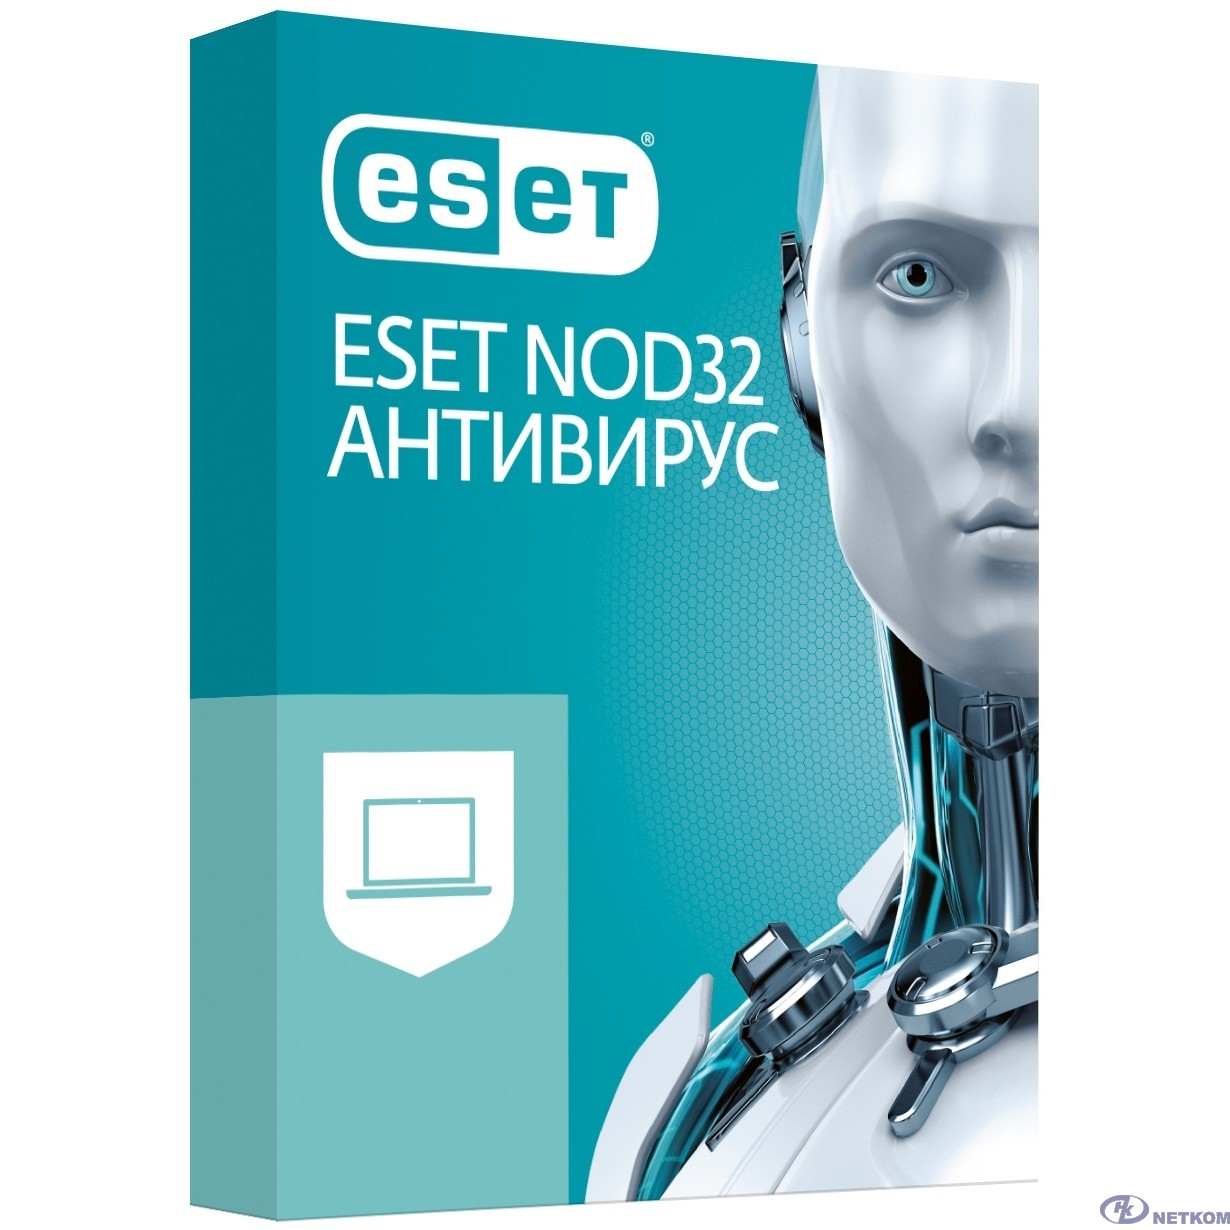 NOD32-ENA-NS(BOX)-2-1 ESET NOD32 Антивирус Platinum Edition [лицензия на 2 года на 3 ПК] [310077]